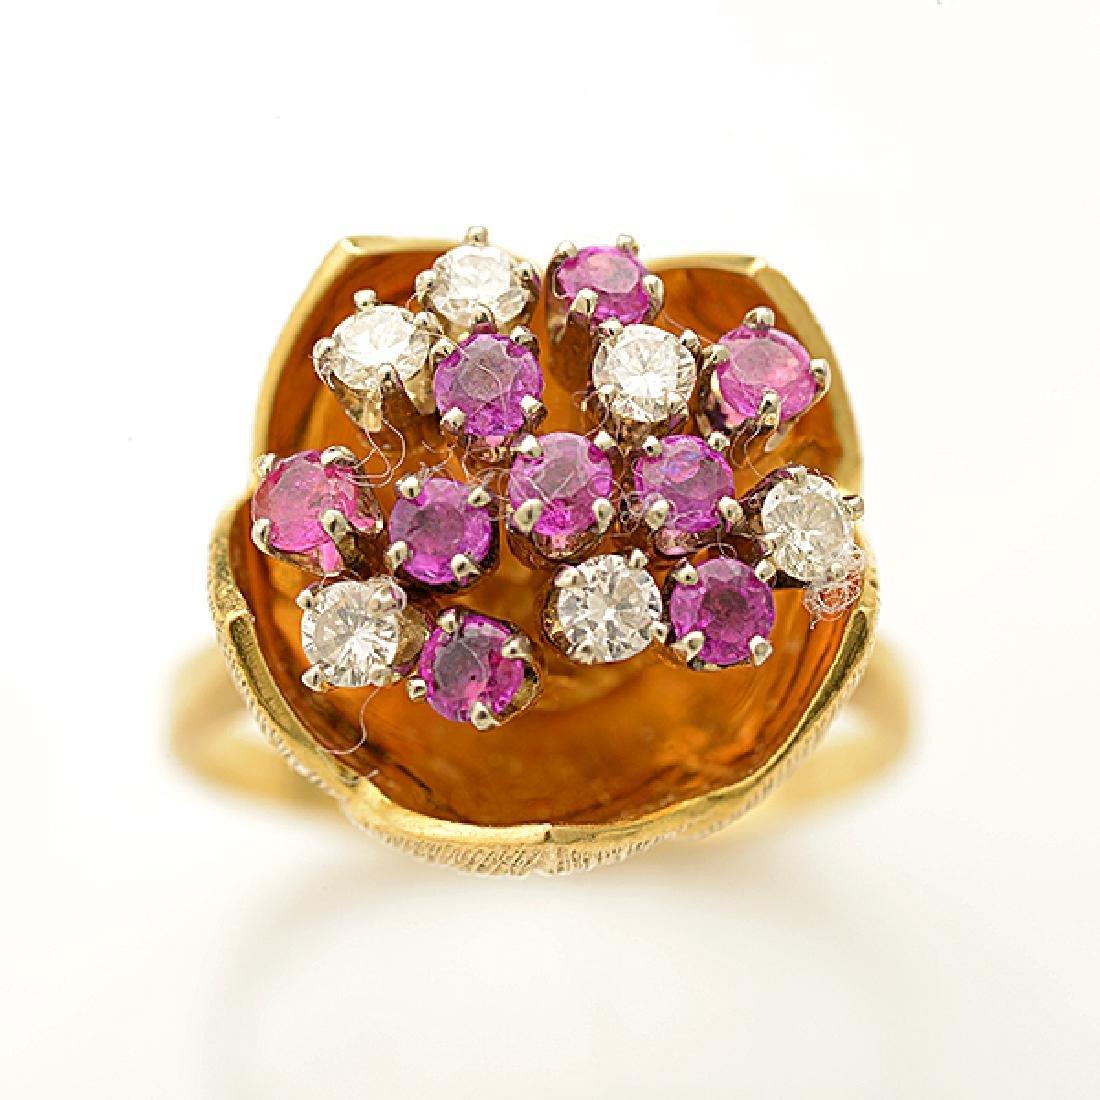 Diamond, Pink Sapphire, 18k Yellow Gold Ring. - 2